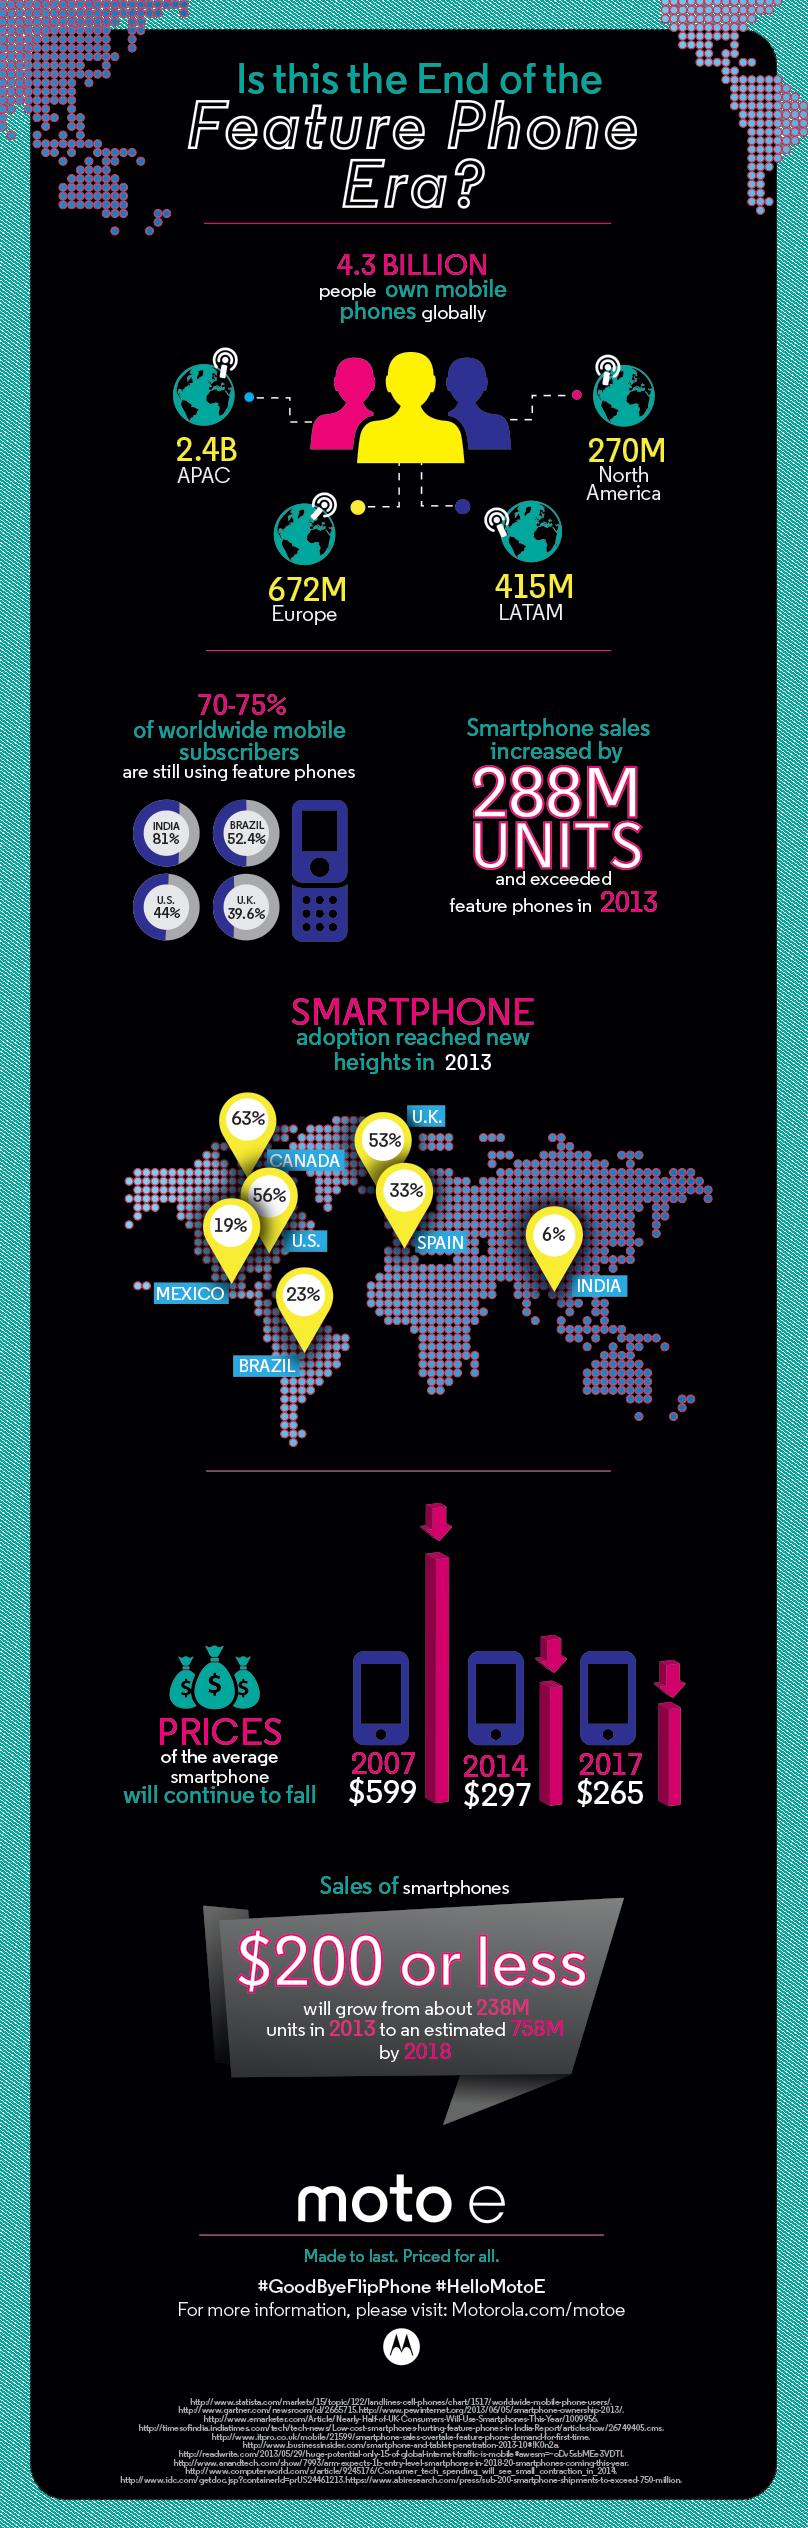 Smartphone InforGraphic